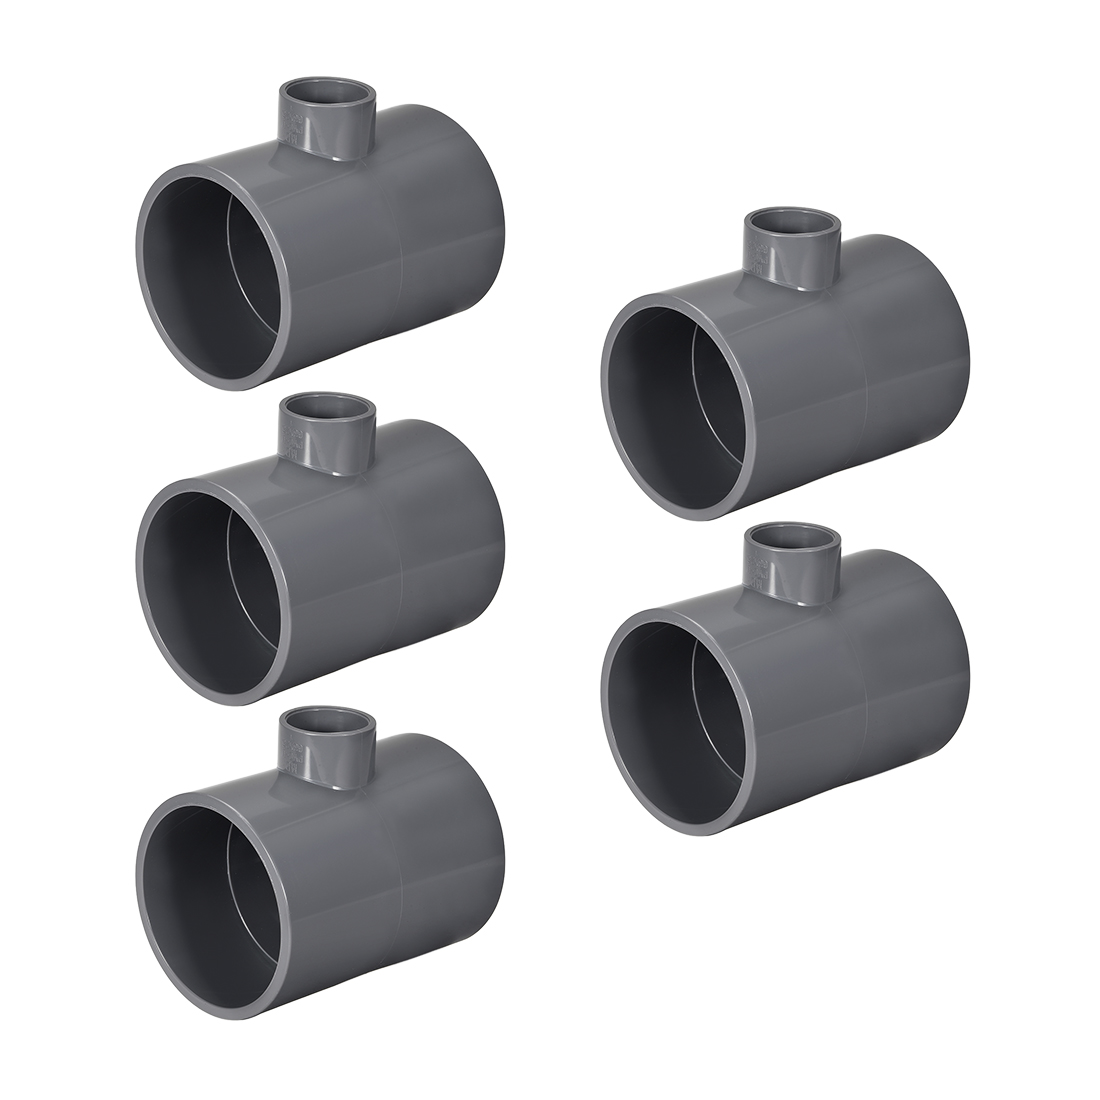 PVC Pipe Fitting Tee 401-Series Gray 1-inch x 2-1/2inch Socket 5pcs